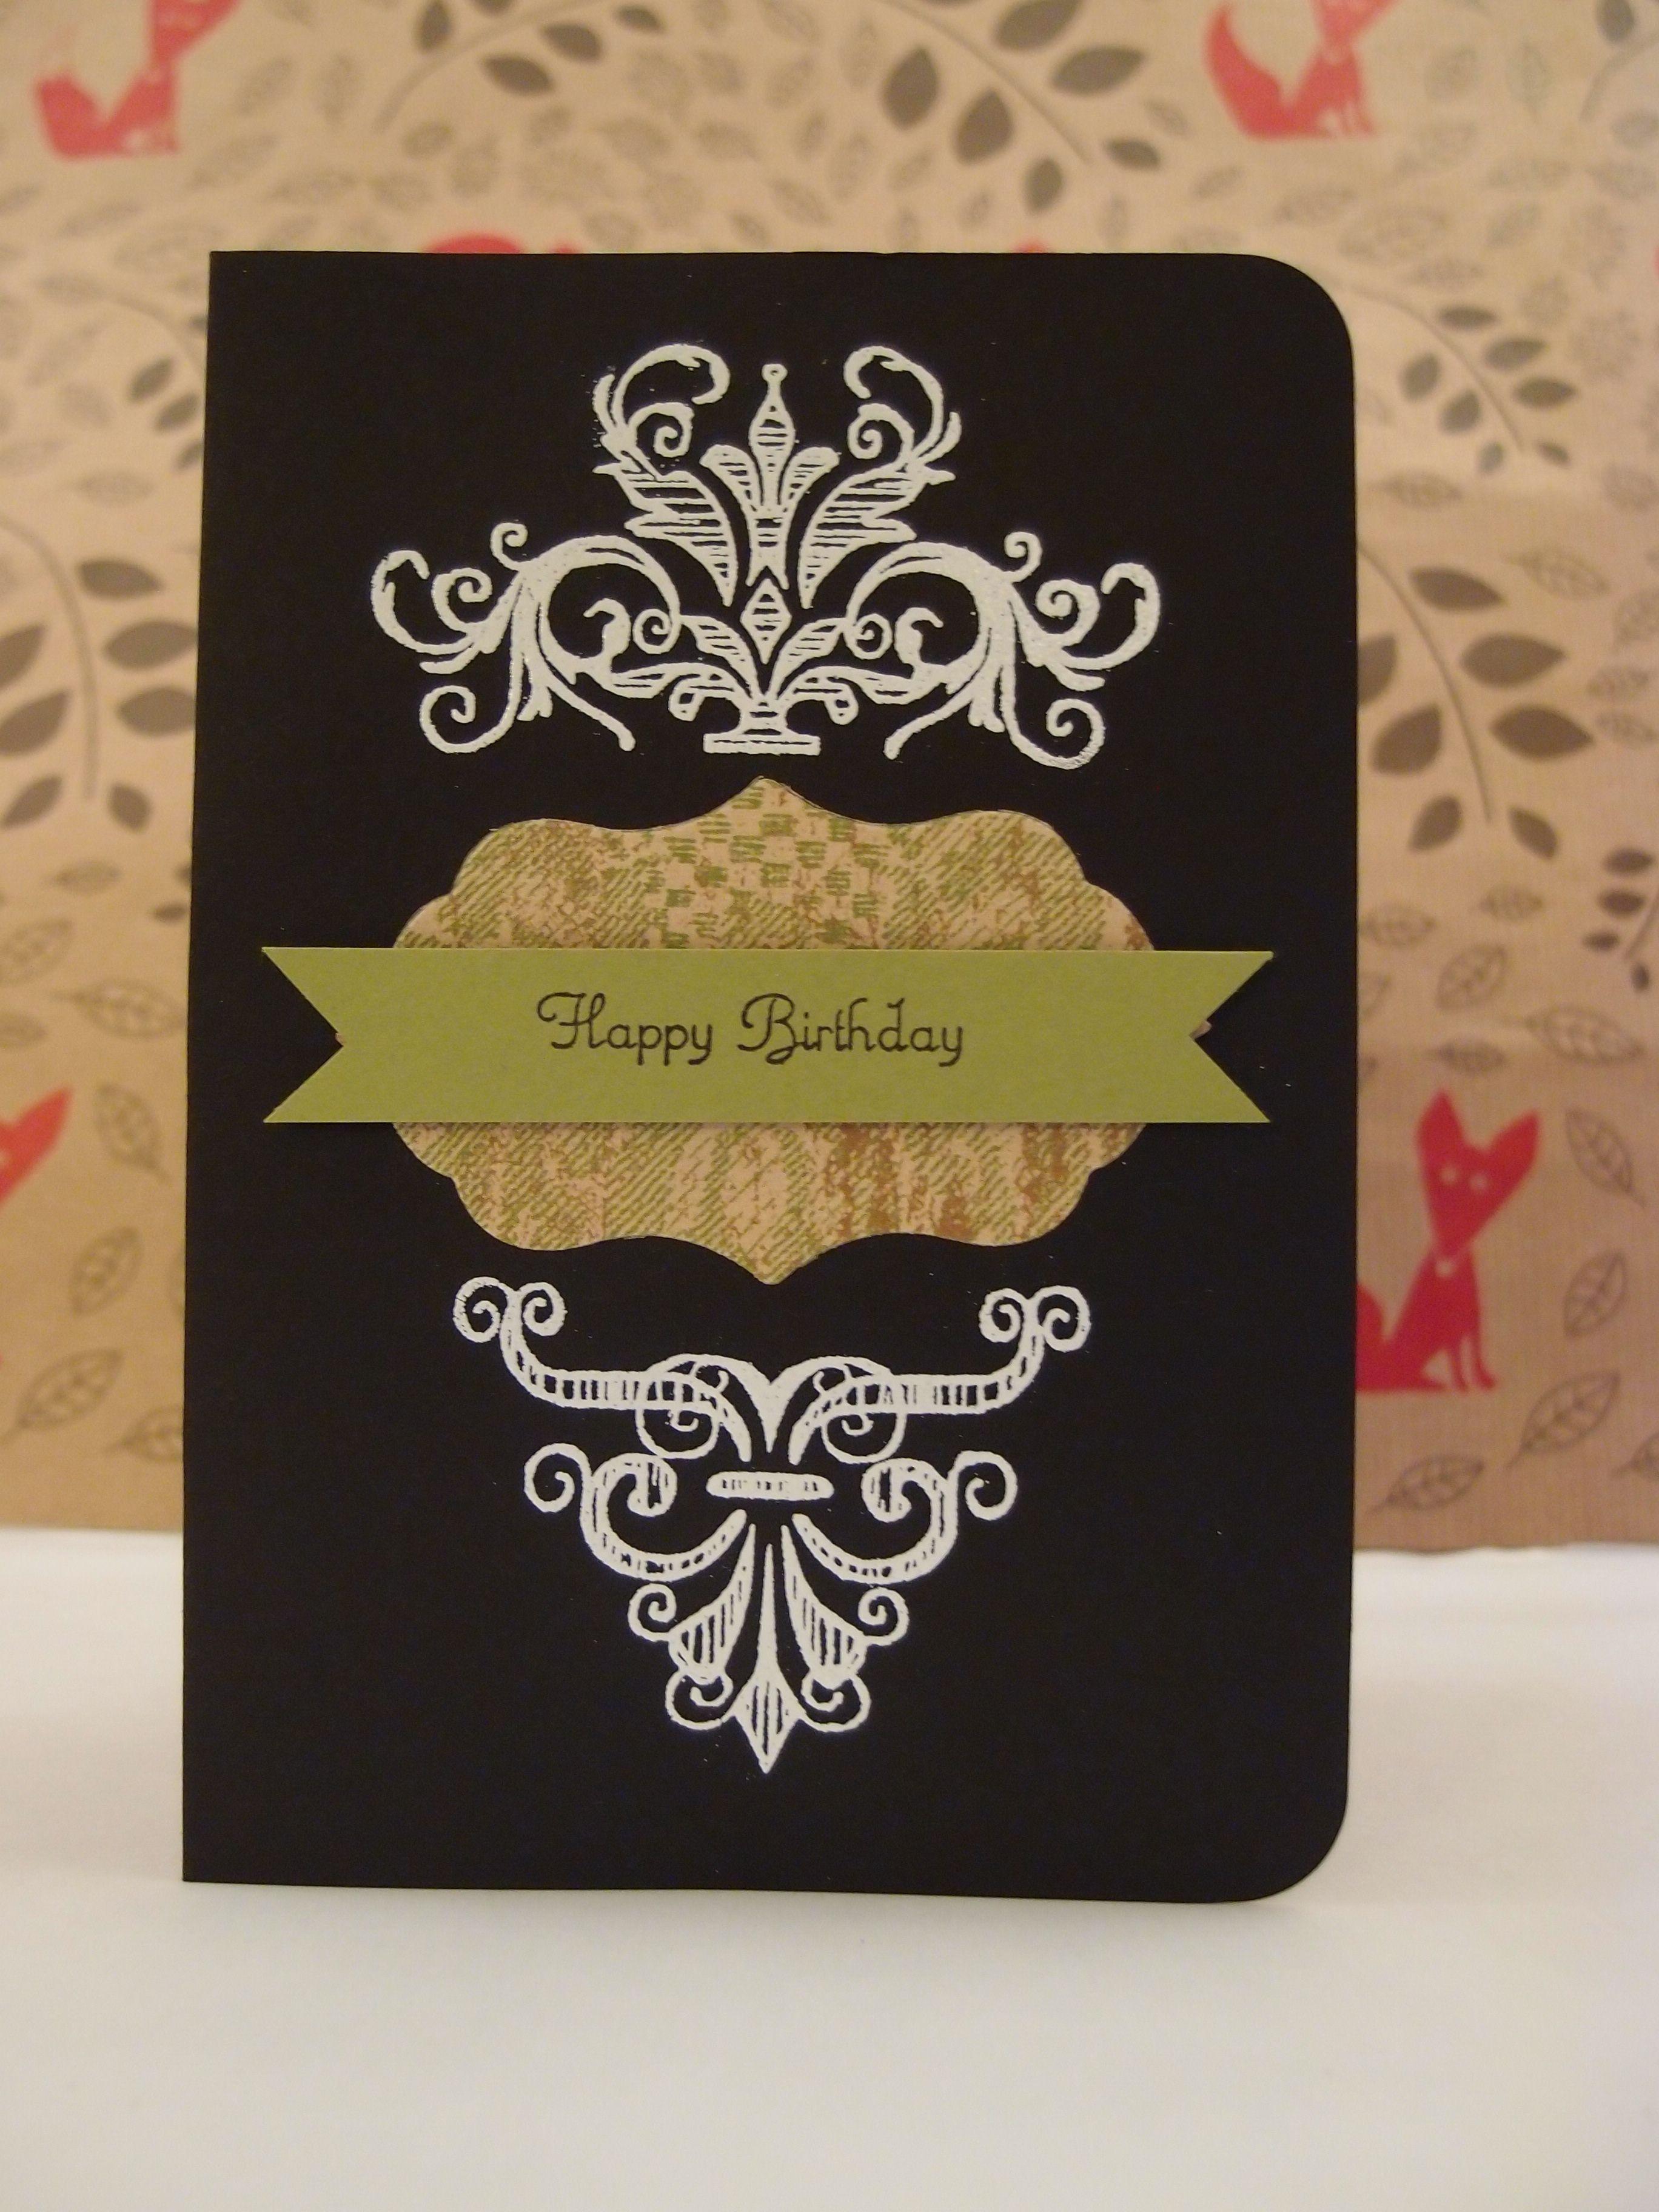 Victorian Gothic Birthday Card Birthday Cards Bday Cards Cards